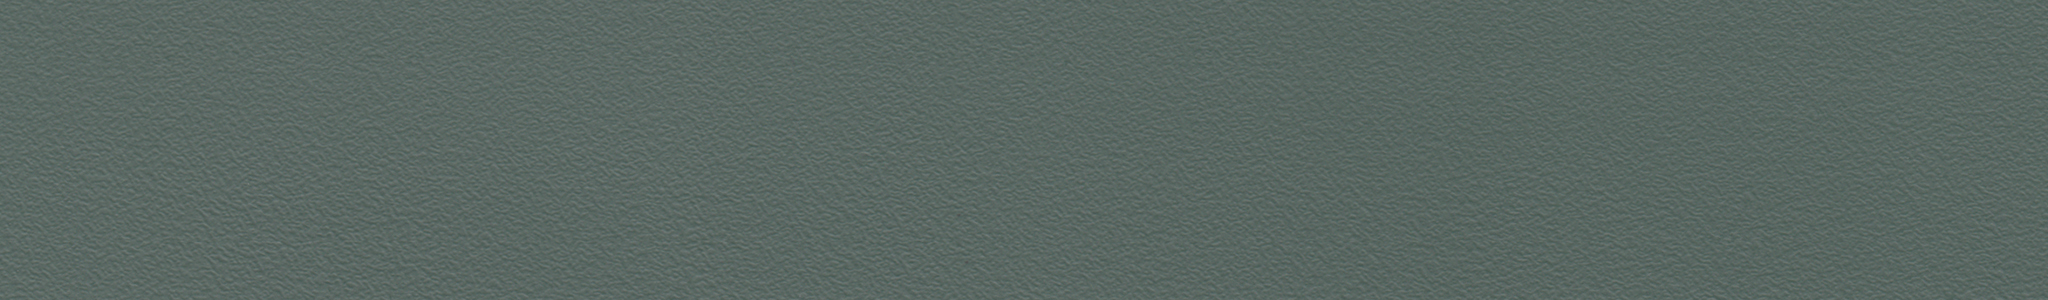 HU 169016 ABS Edge Bottle Green Pearl XG